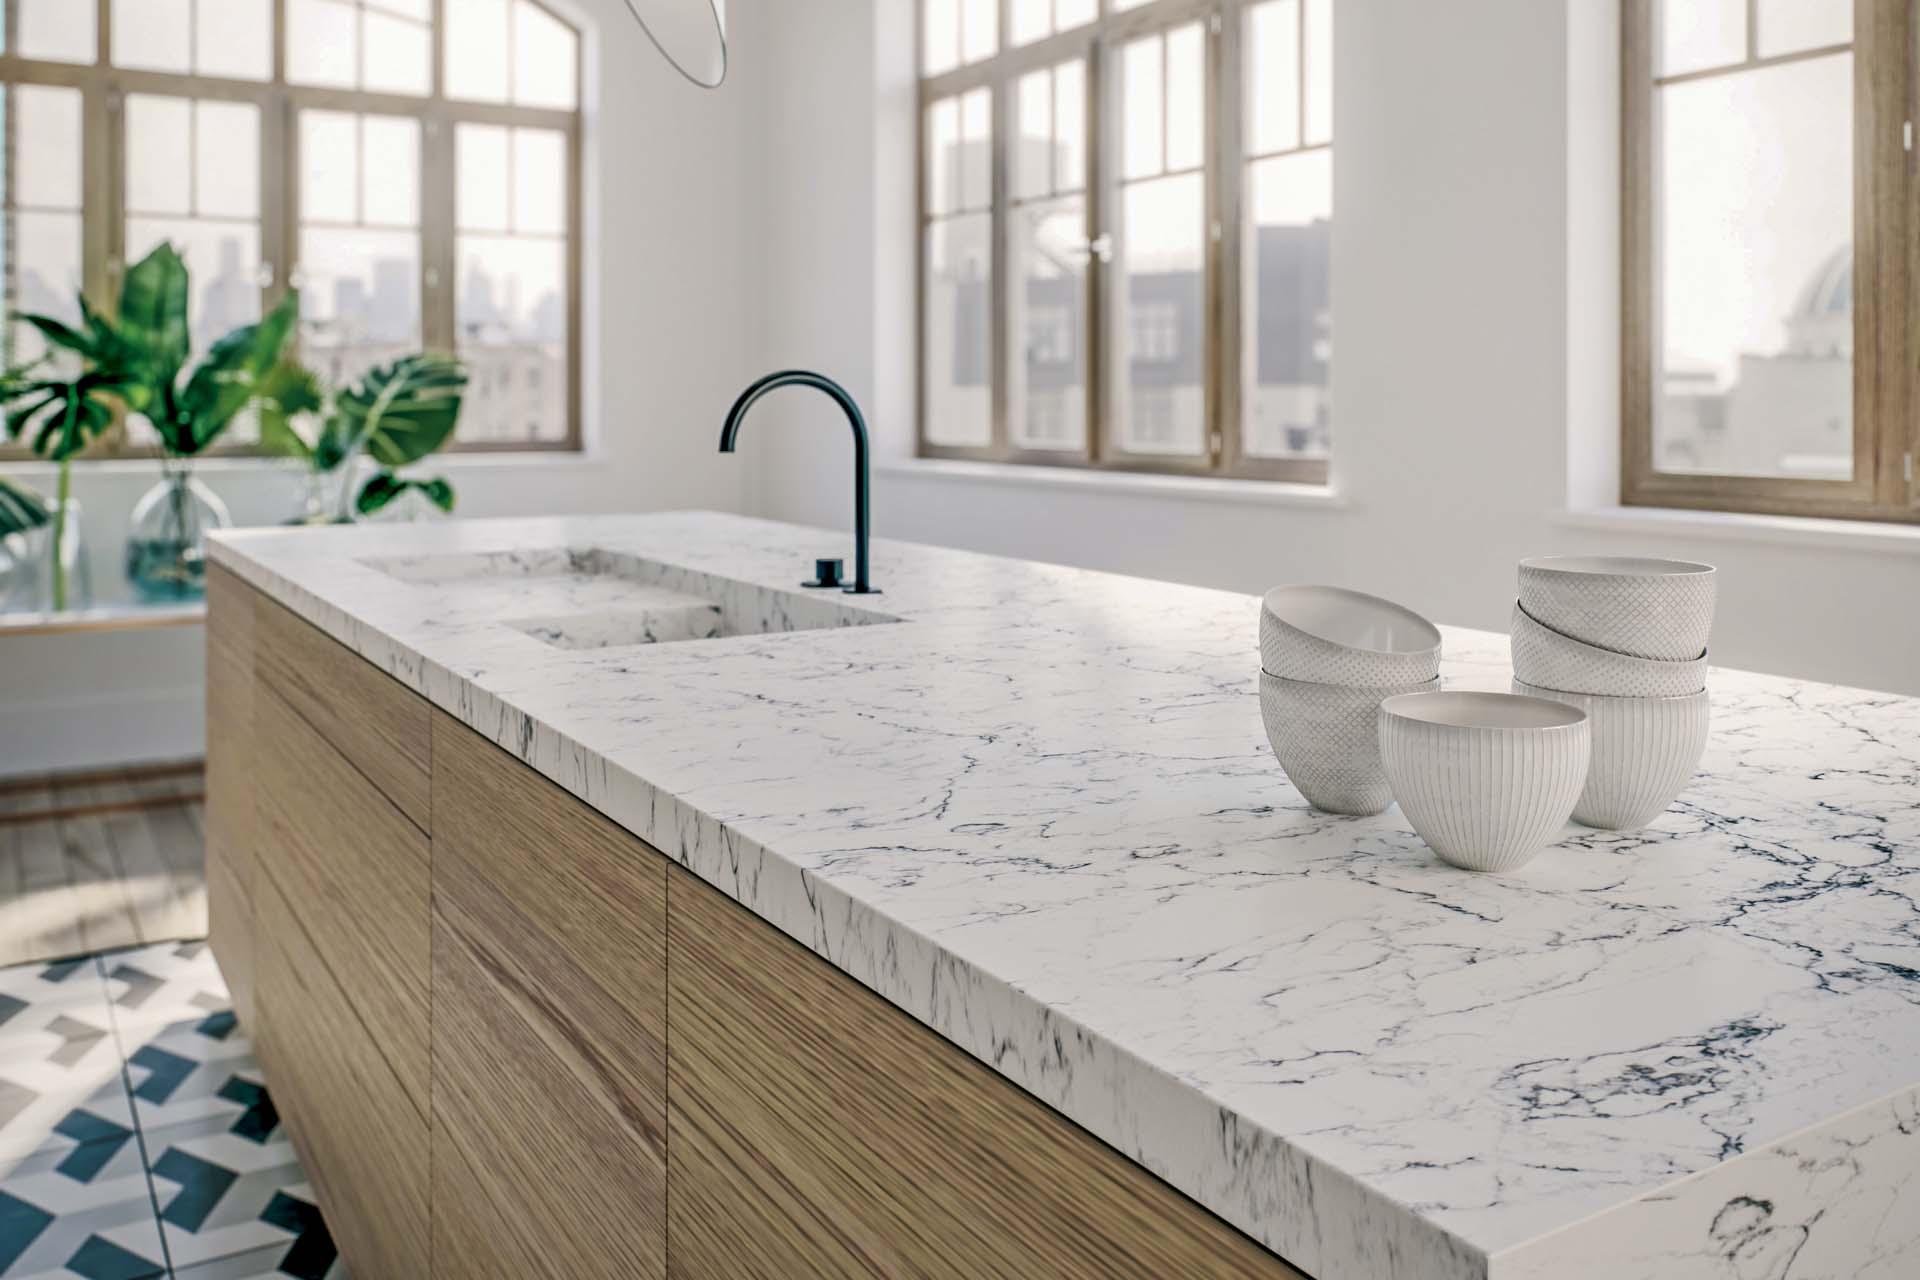 Caesarstone 5143 White Attica special offer quartz worktops guildford surrey